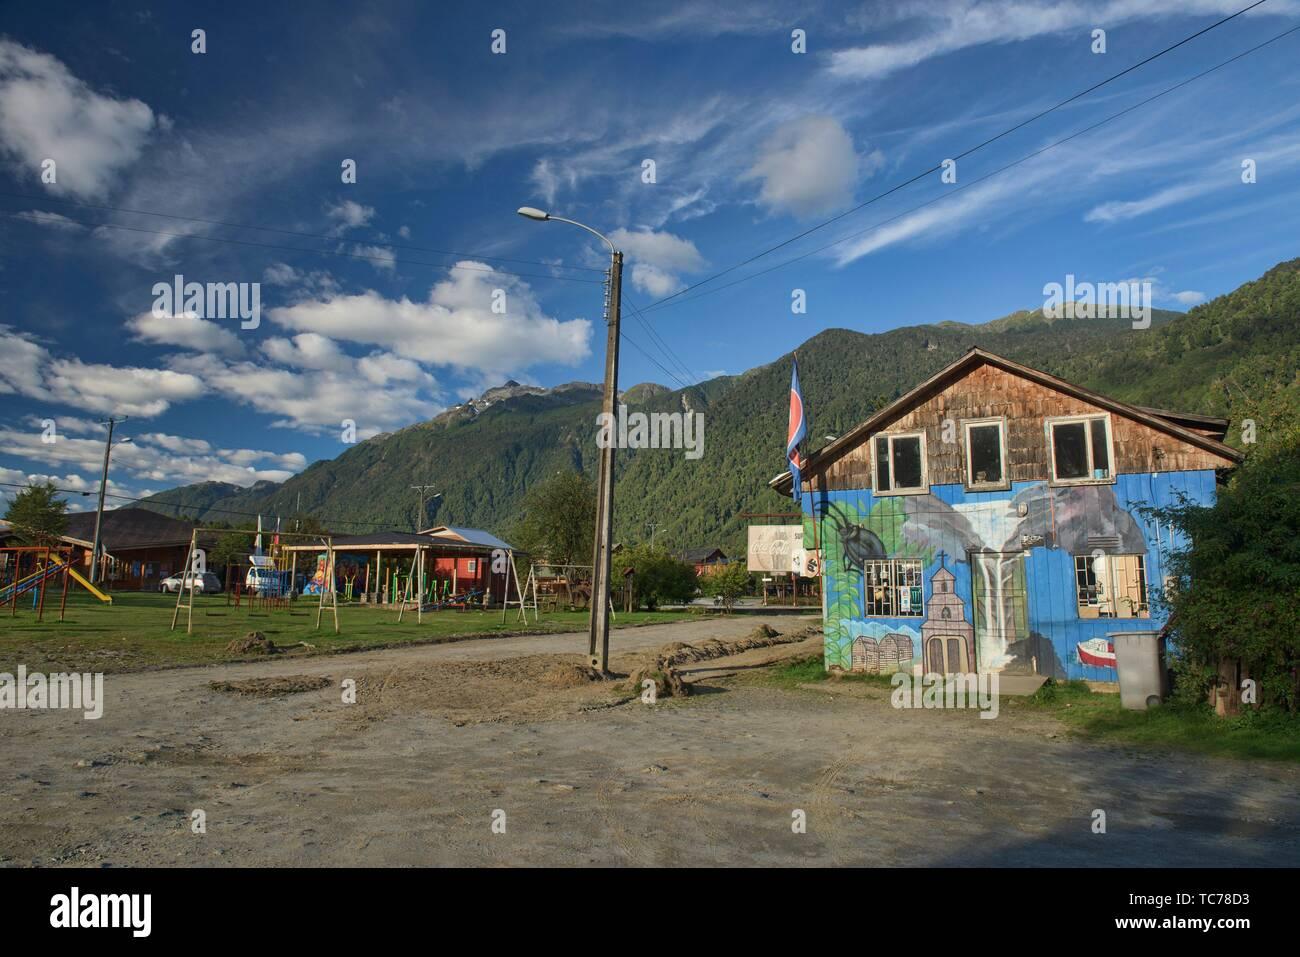 Small town life, Puyuhuapi, Carretera Austral, Patagonia, Aysen, Chile. - Stock Image